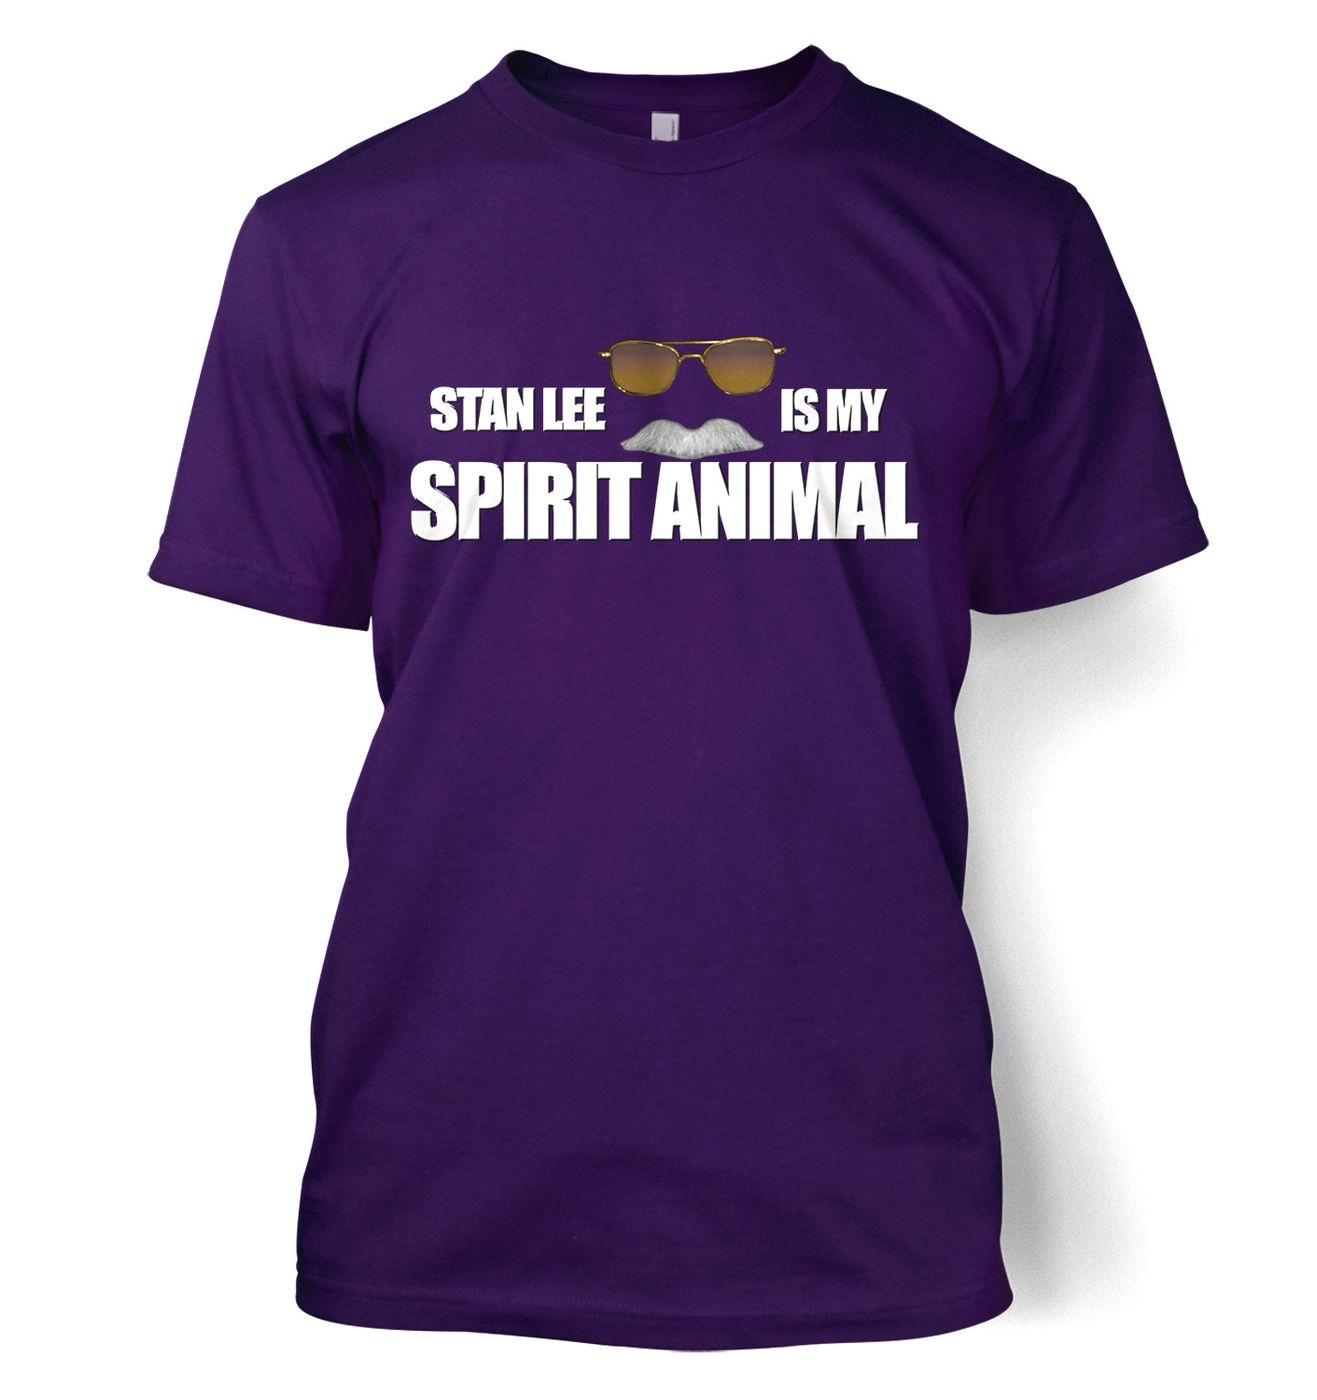 Stan Lee Is My Spirit Animal t-shirt